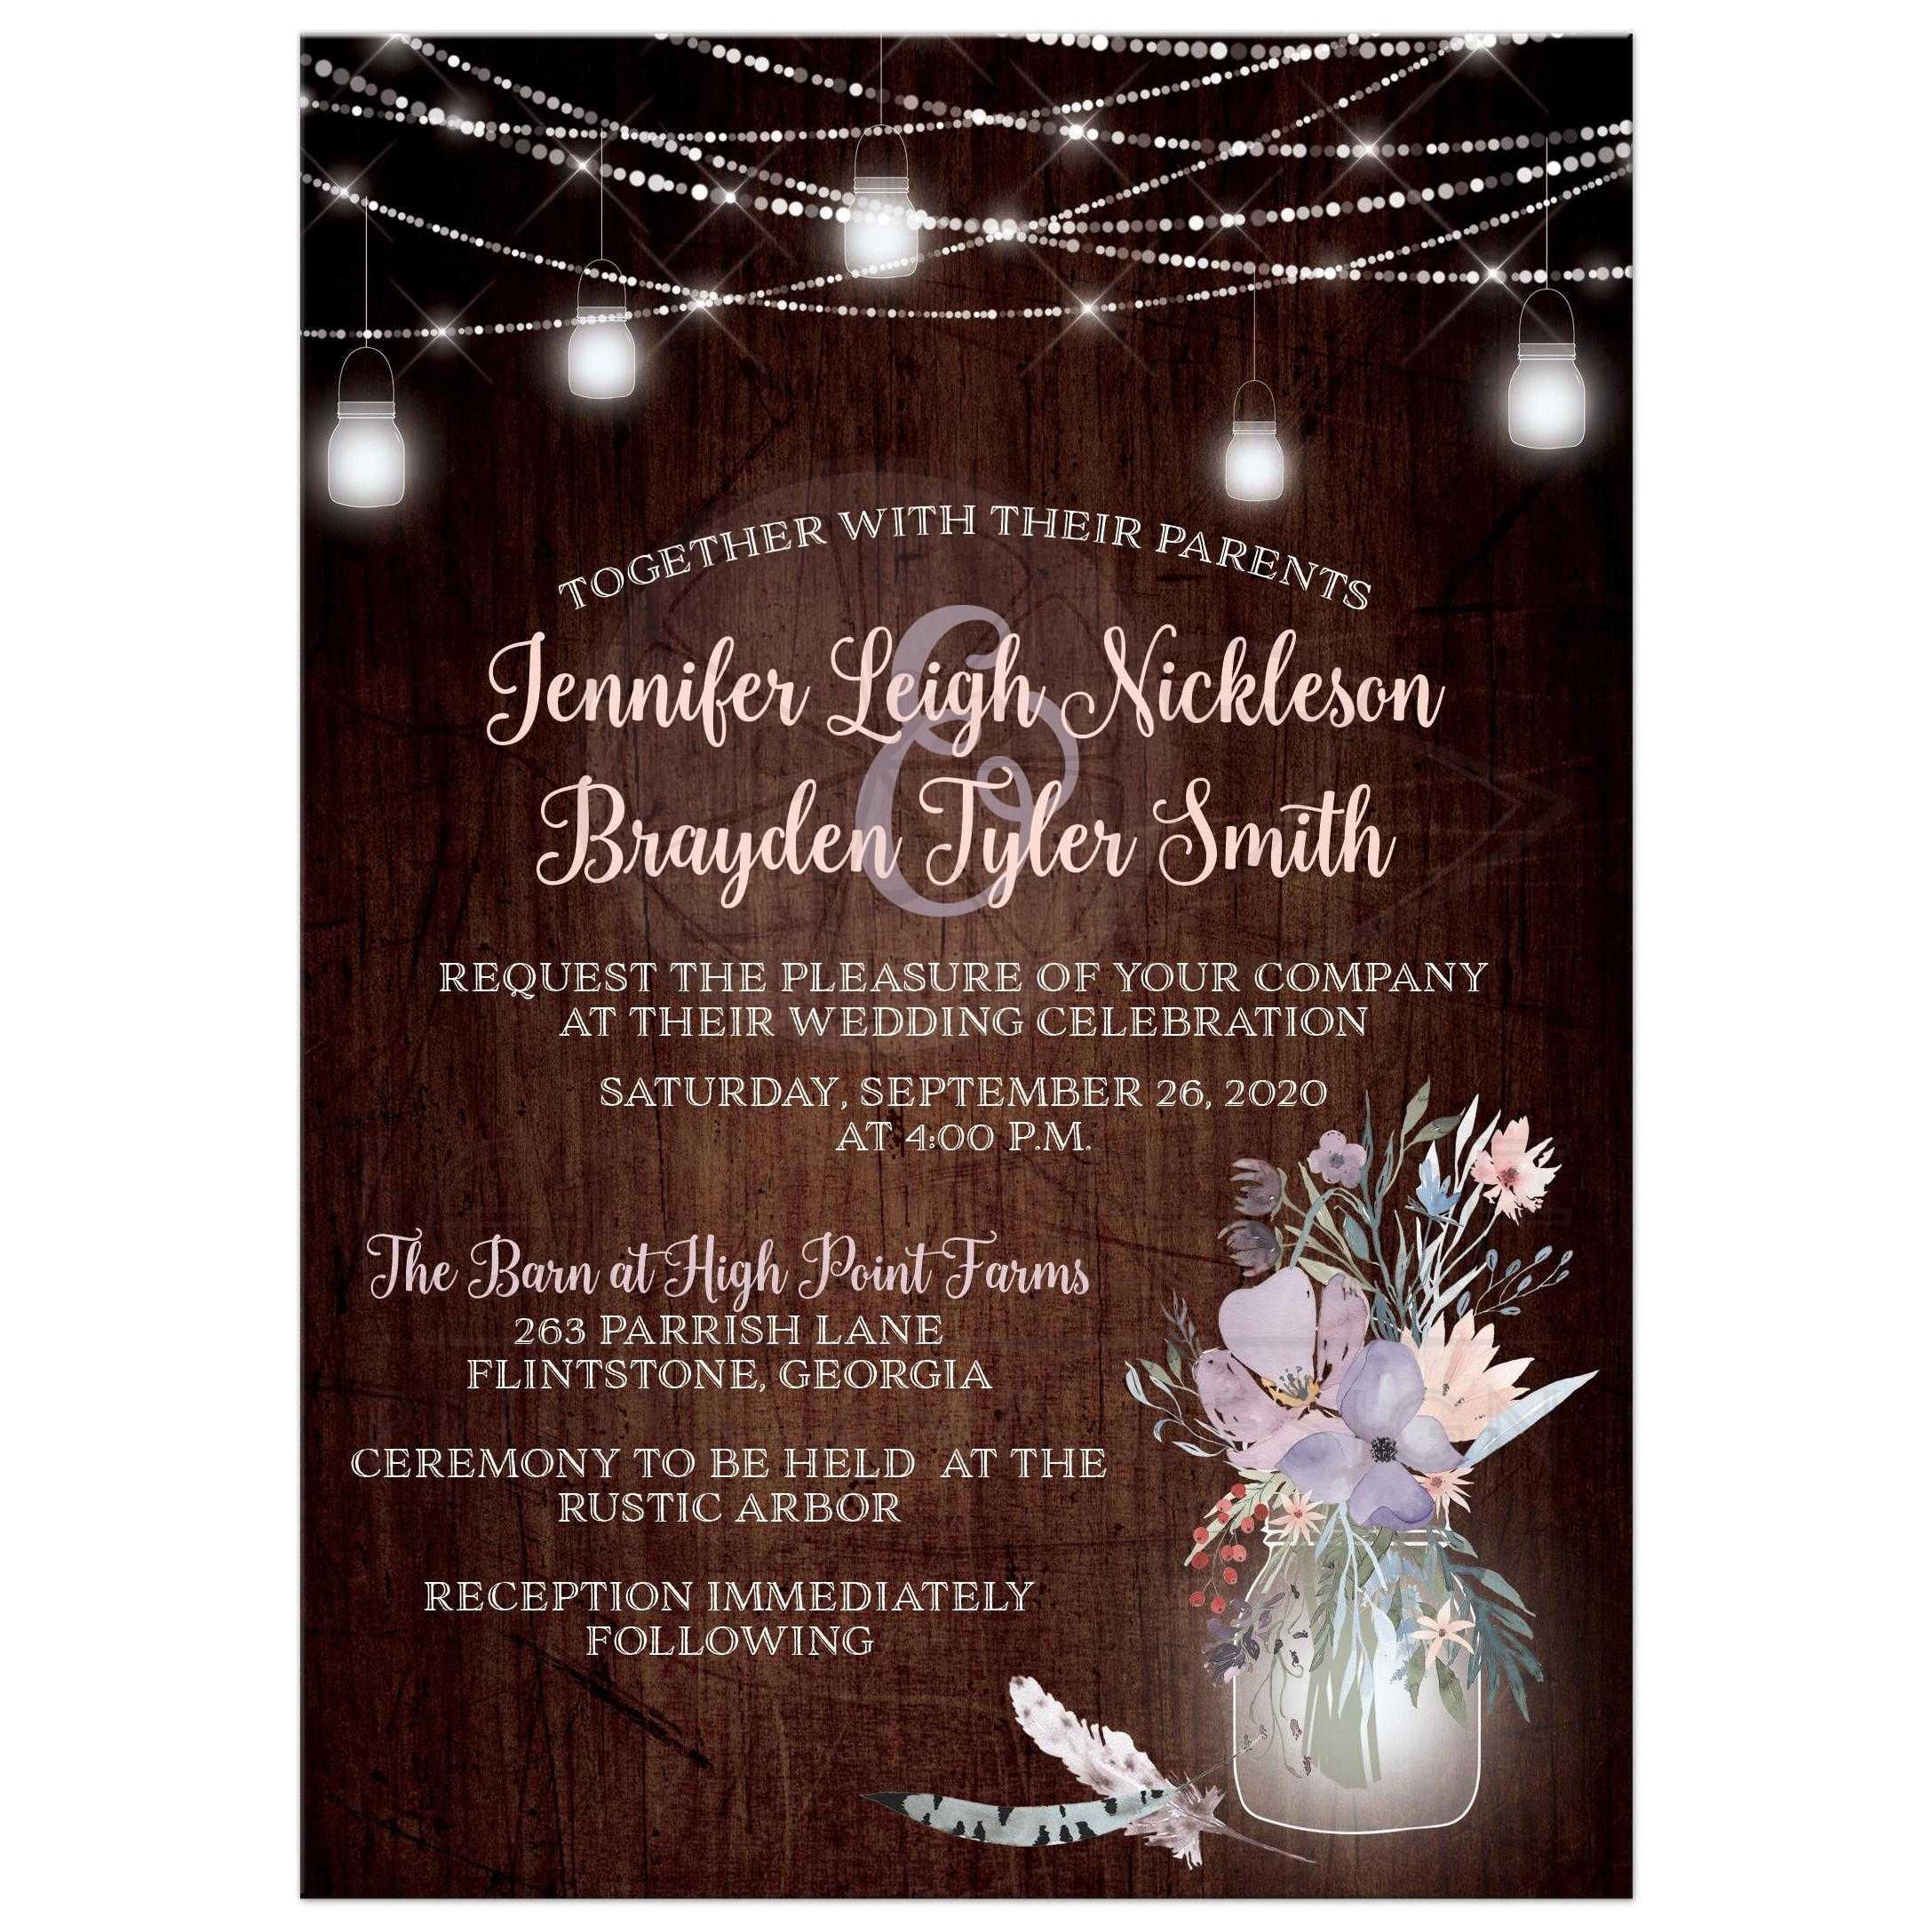 Rustic Wood Look String Lights And Mason Jars Wedding Invitation With Smoky Blue Purple Peach Flowers